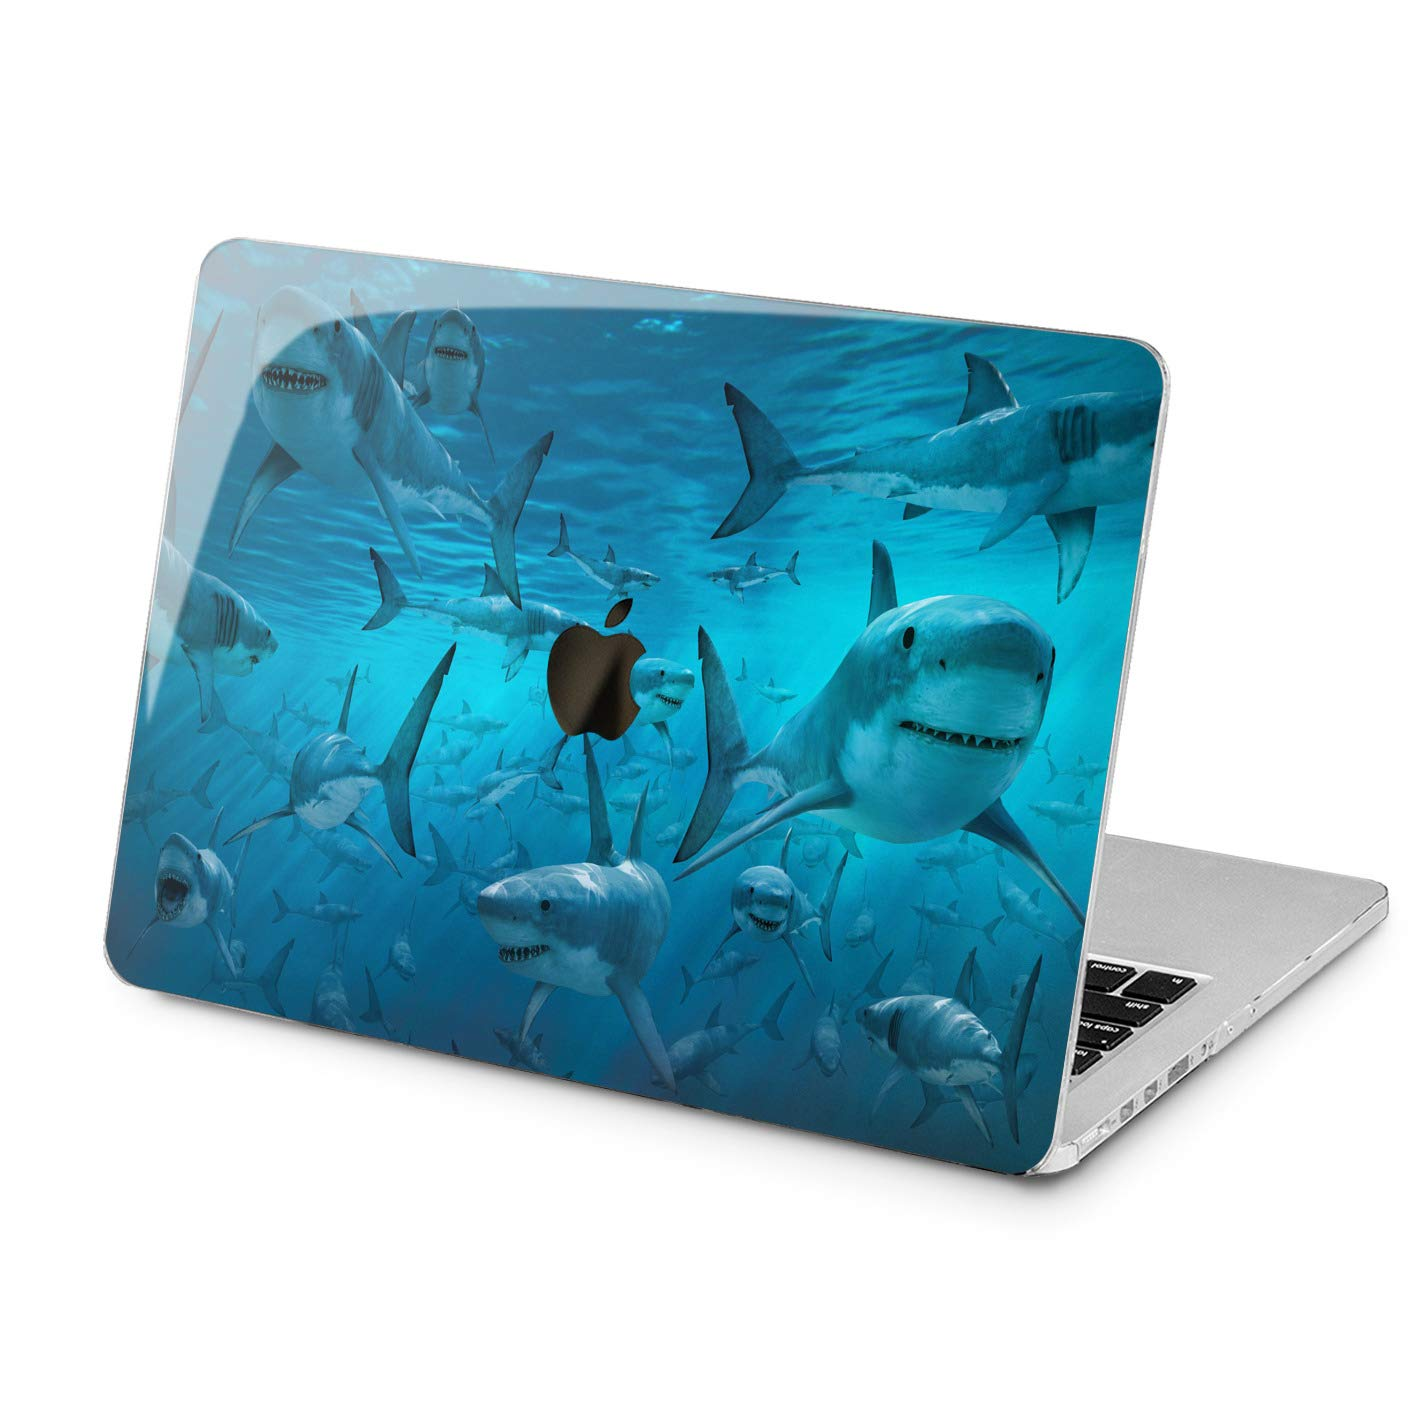 Lex Altern Hard MacBook Pro 15 Case Air 13 inch Mac Retina 12 11 2019 2018 2017 2016 2015 Ocean White Sharks Laptop Apple Fish Cover Deep Design Touch Bar Print Blue Plastic Protective Fish Impact